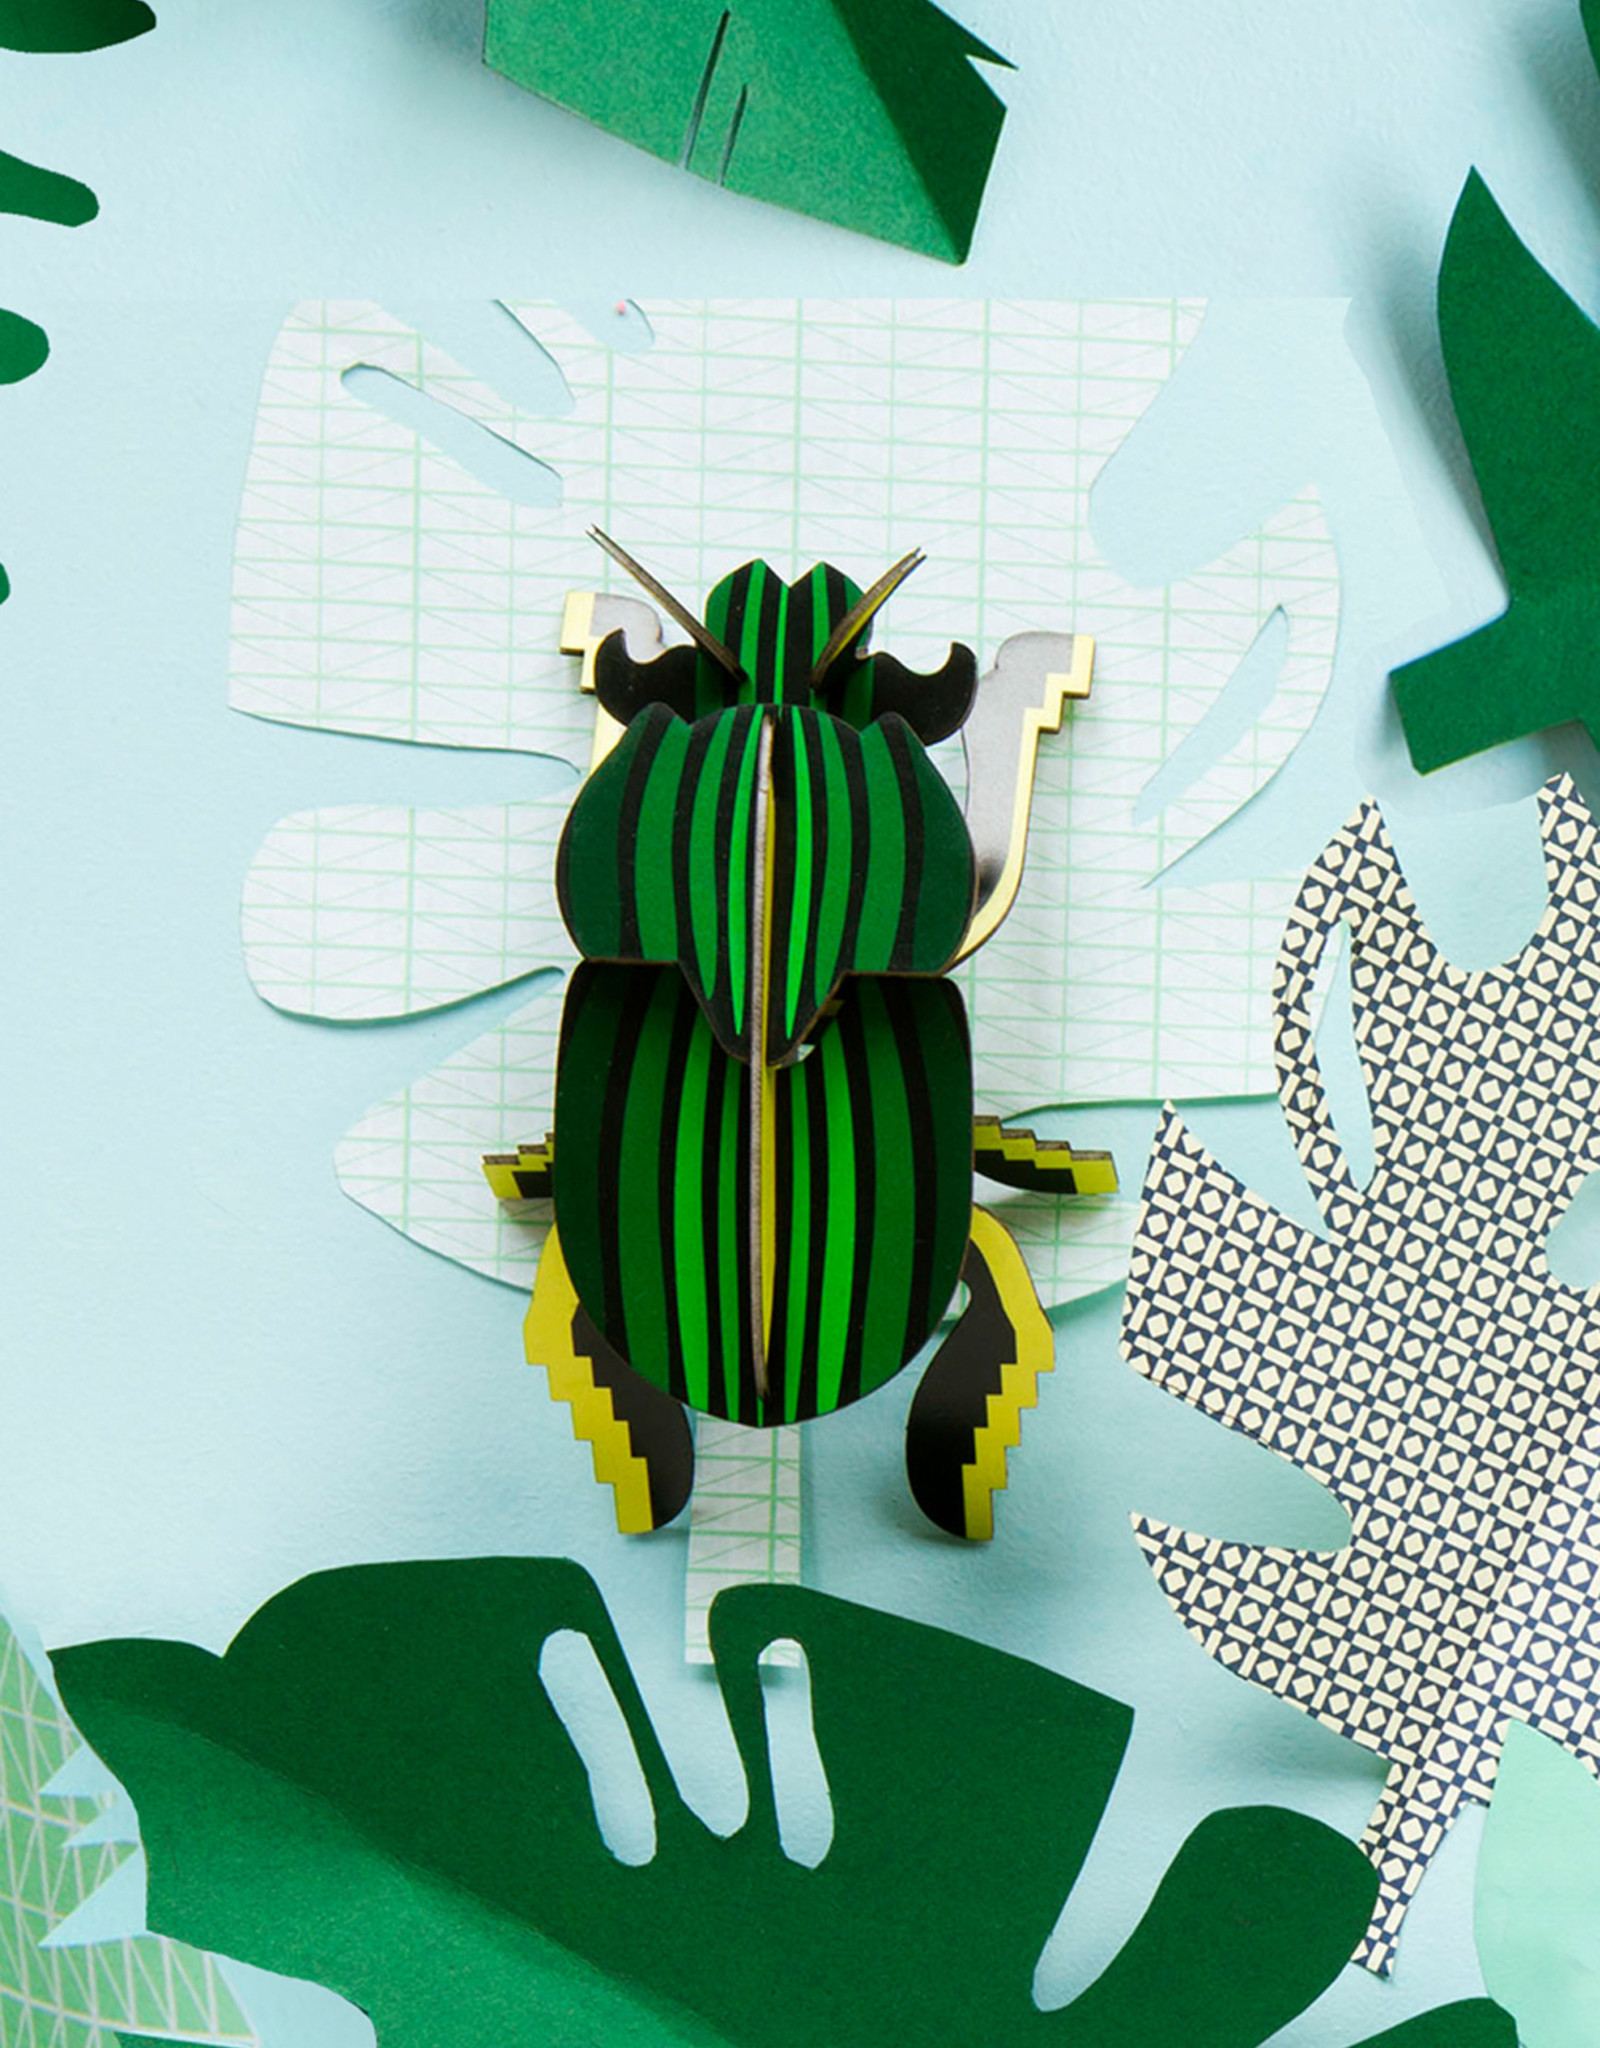 Studioroof Wall Decor Scarab Beetle small